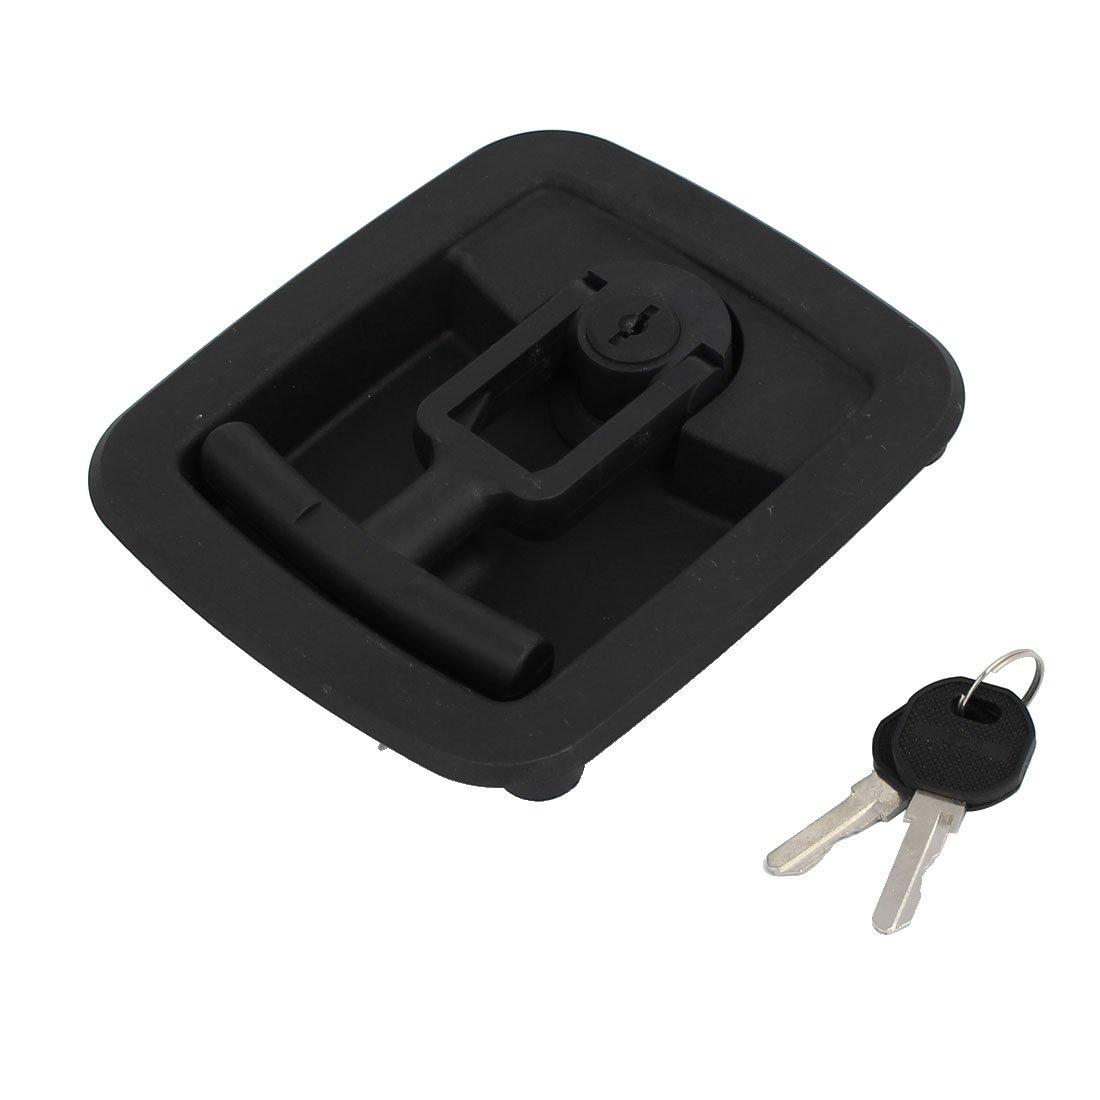 uxcell Door Toolbox Plastic Folding T-handle Security Latch Lock Locker Black w 2 Keys by uxcell (Image #3)